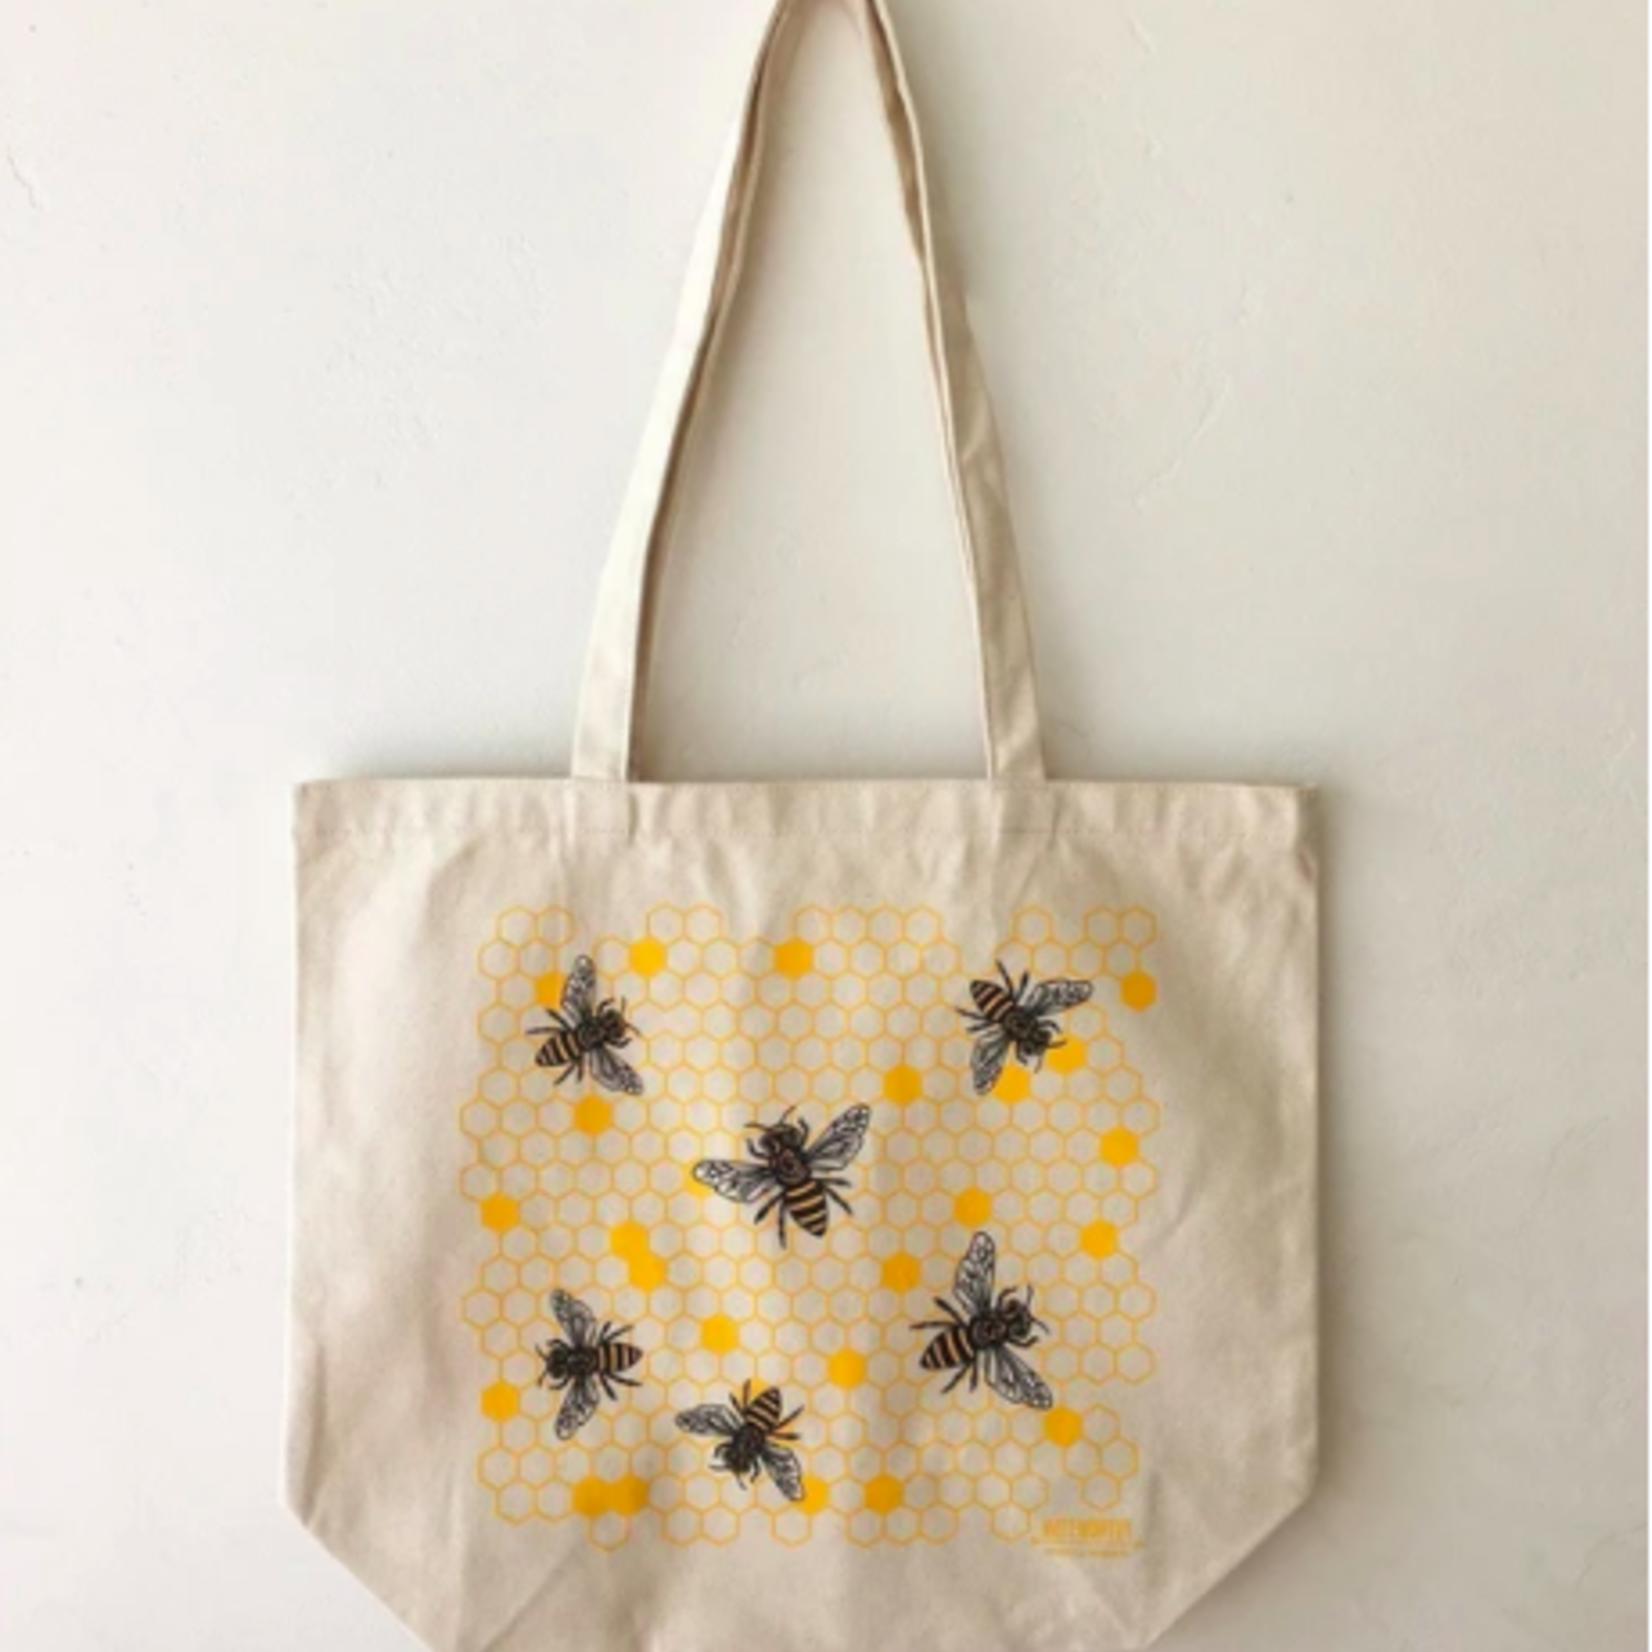 Noteworthy Honey Bees Tote Bag